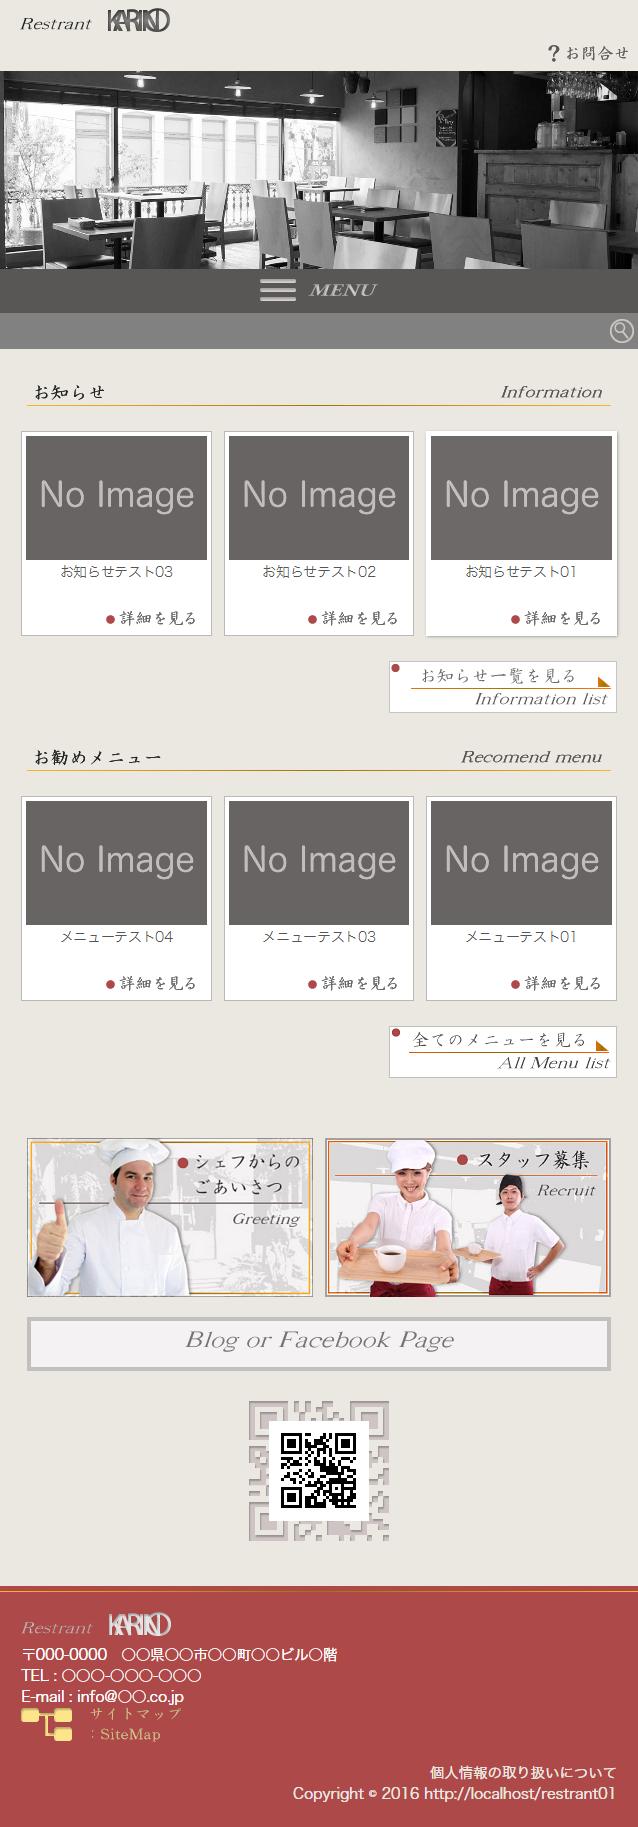 restrant_image03